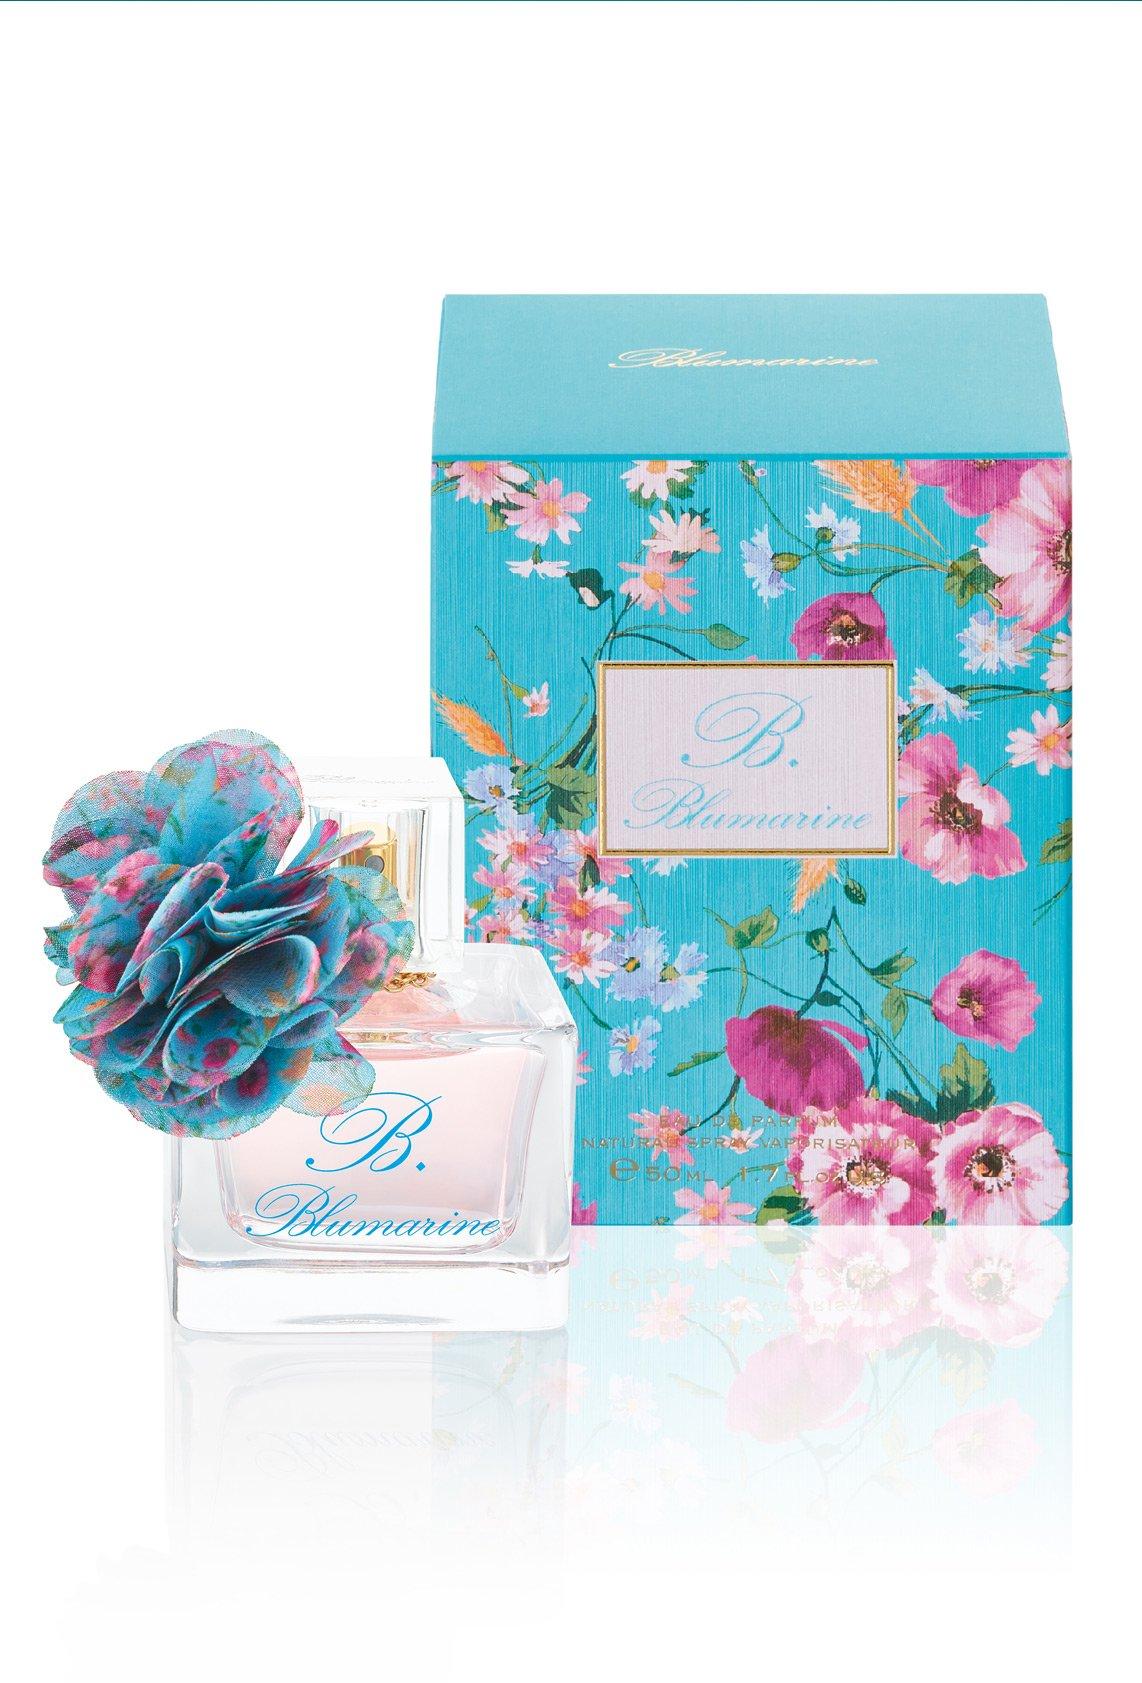 The new B. Blumarine Fragrance